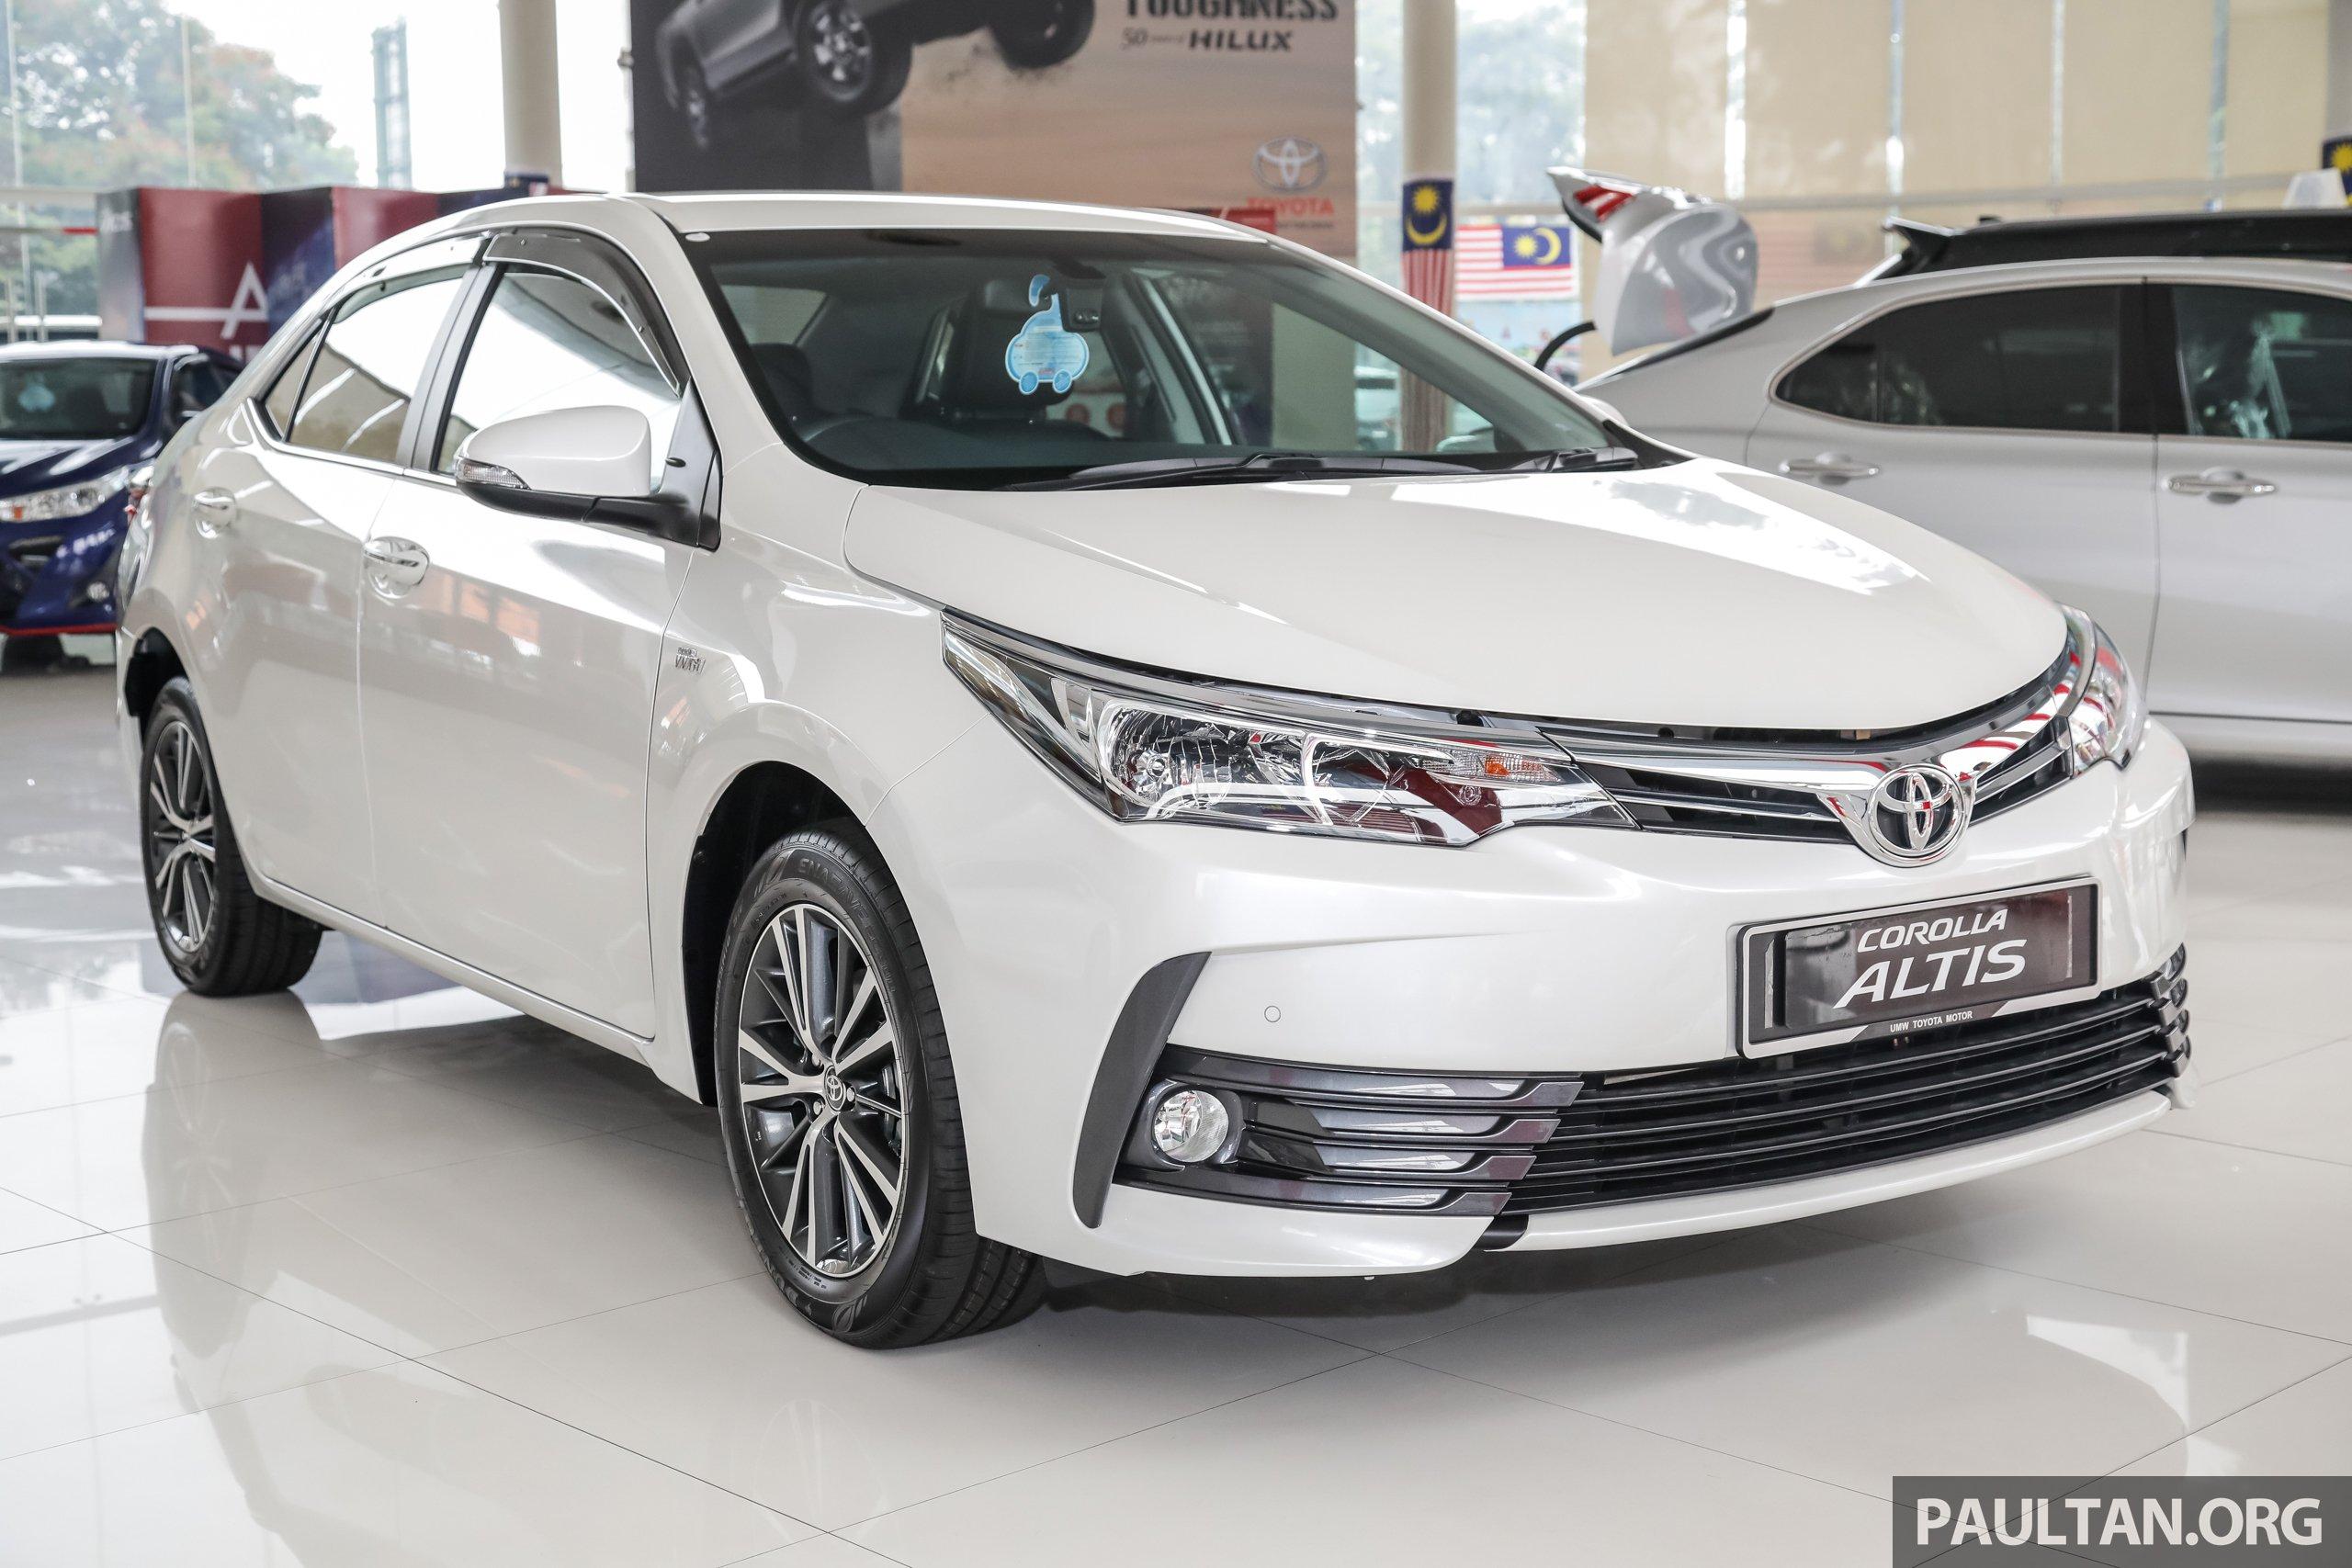 Kelebihan Kekurangan Corolla Altis 2018 Review